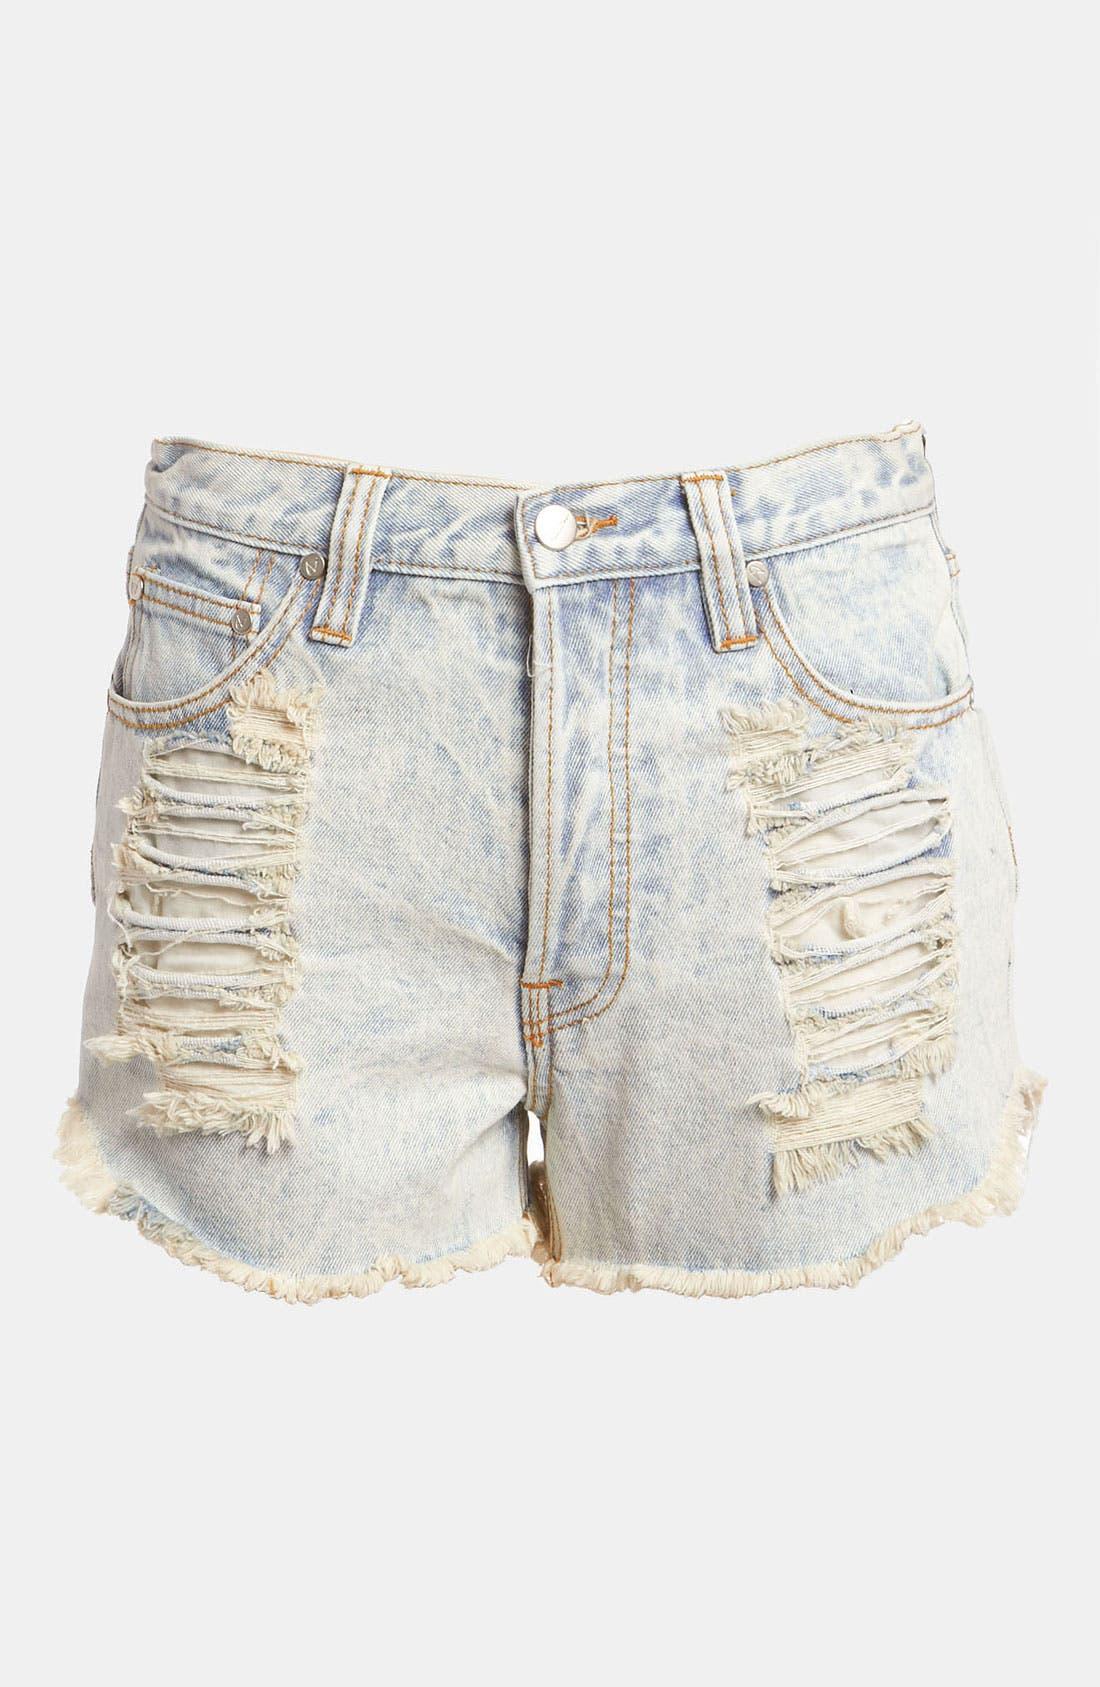 Alternate Image 1 Selected - MINKPINK 'Slasher Flick' Acid Wash Shorts